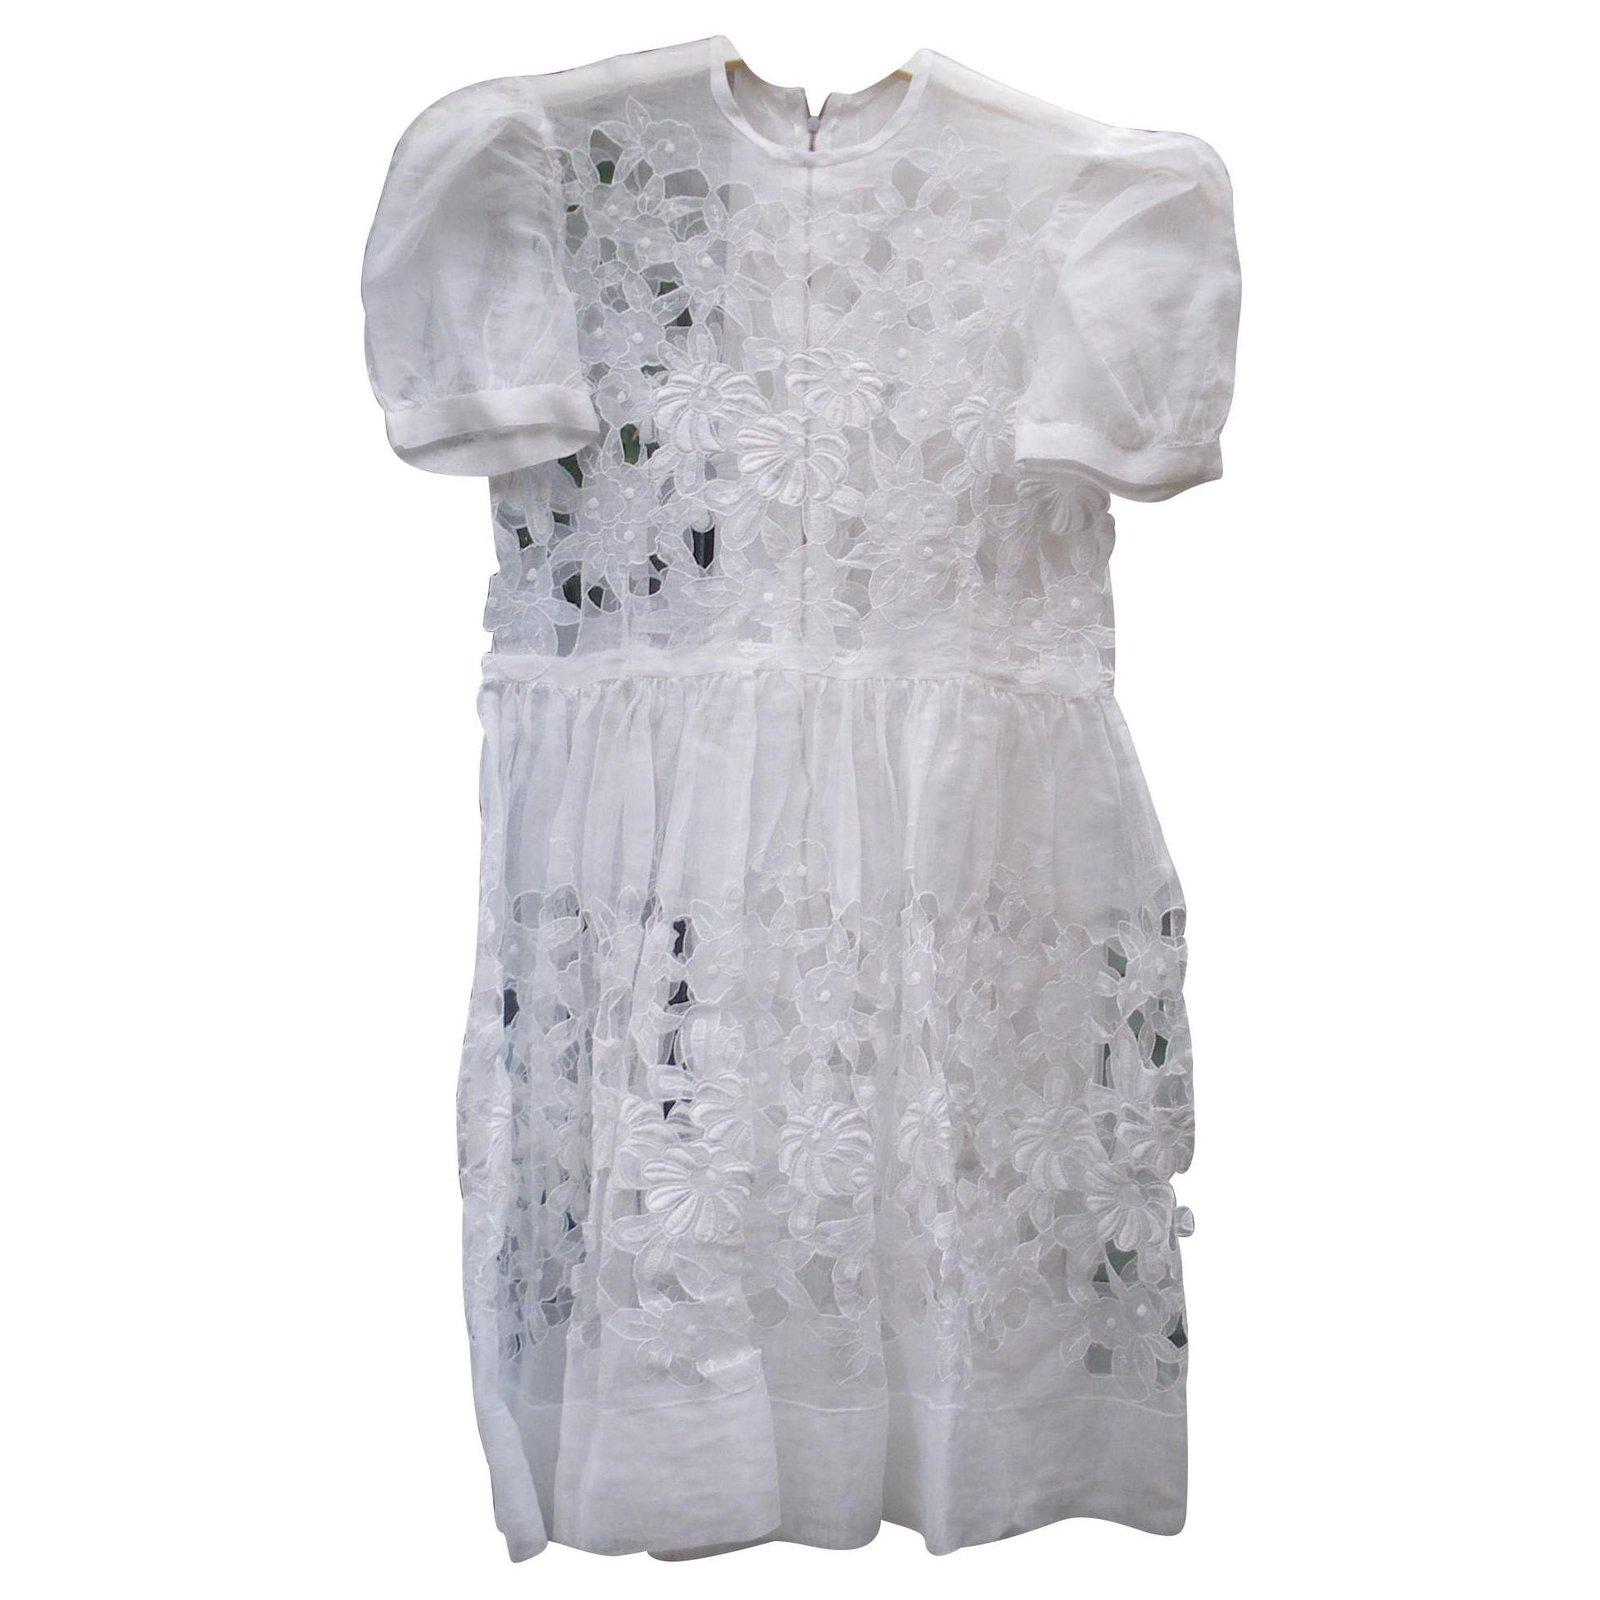 Robes Fille Autre Marque Robes Tulle Blanc Ref 129536 Joli Closet